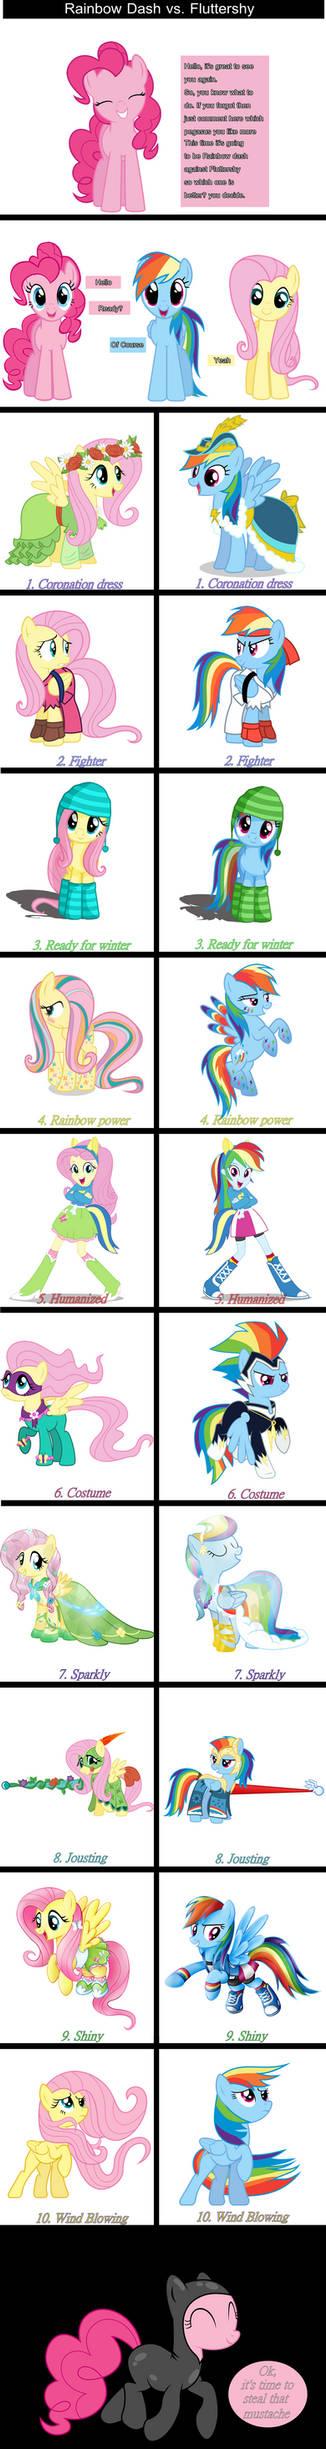 Fluttershy VS. Rainbow Dash